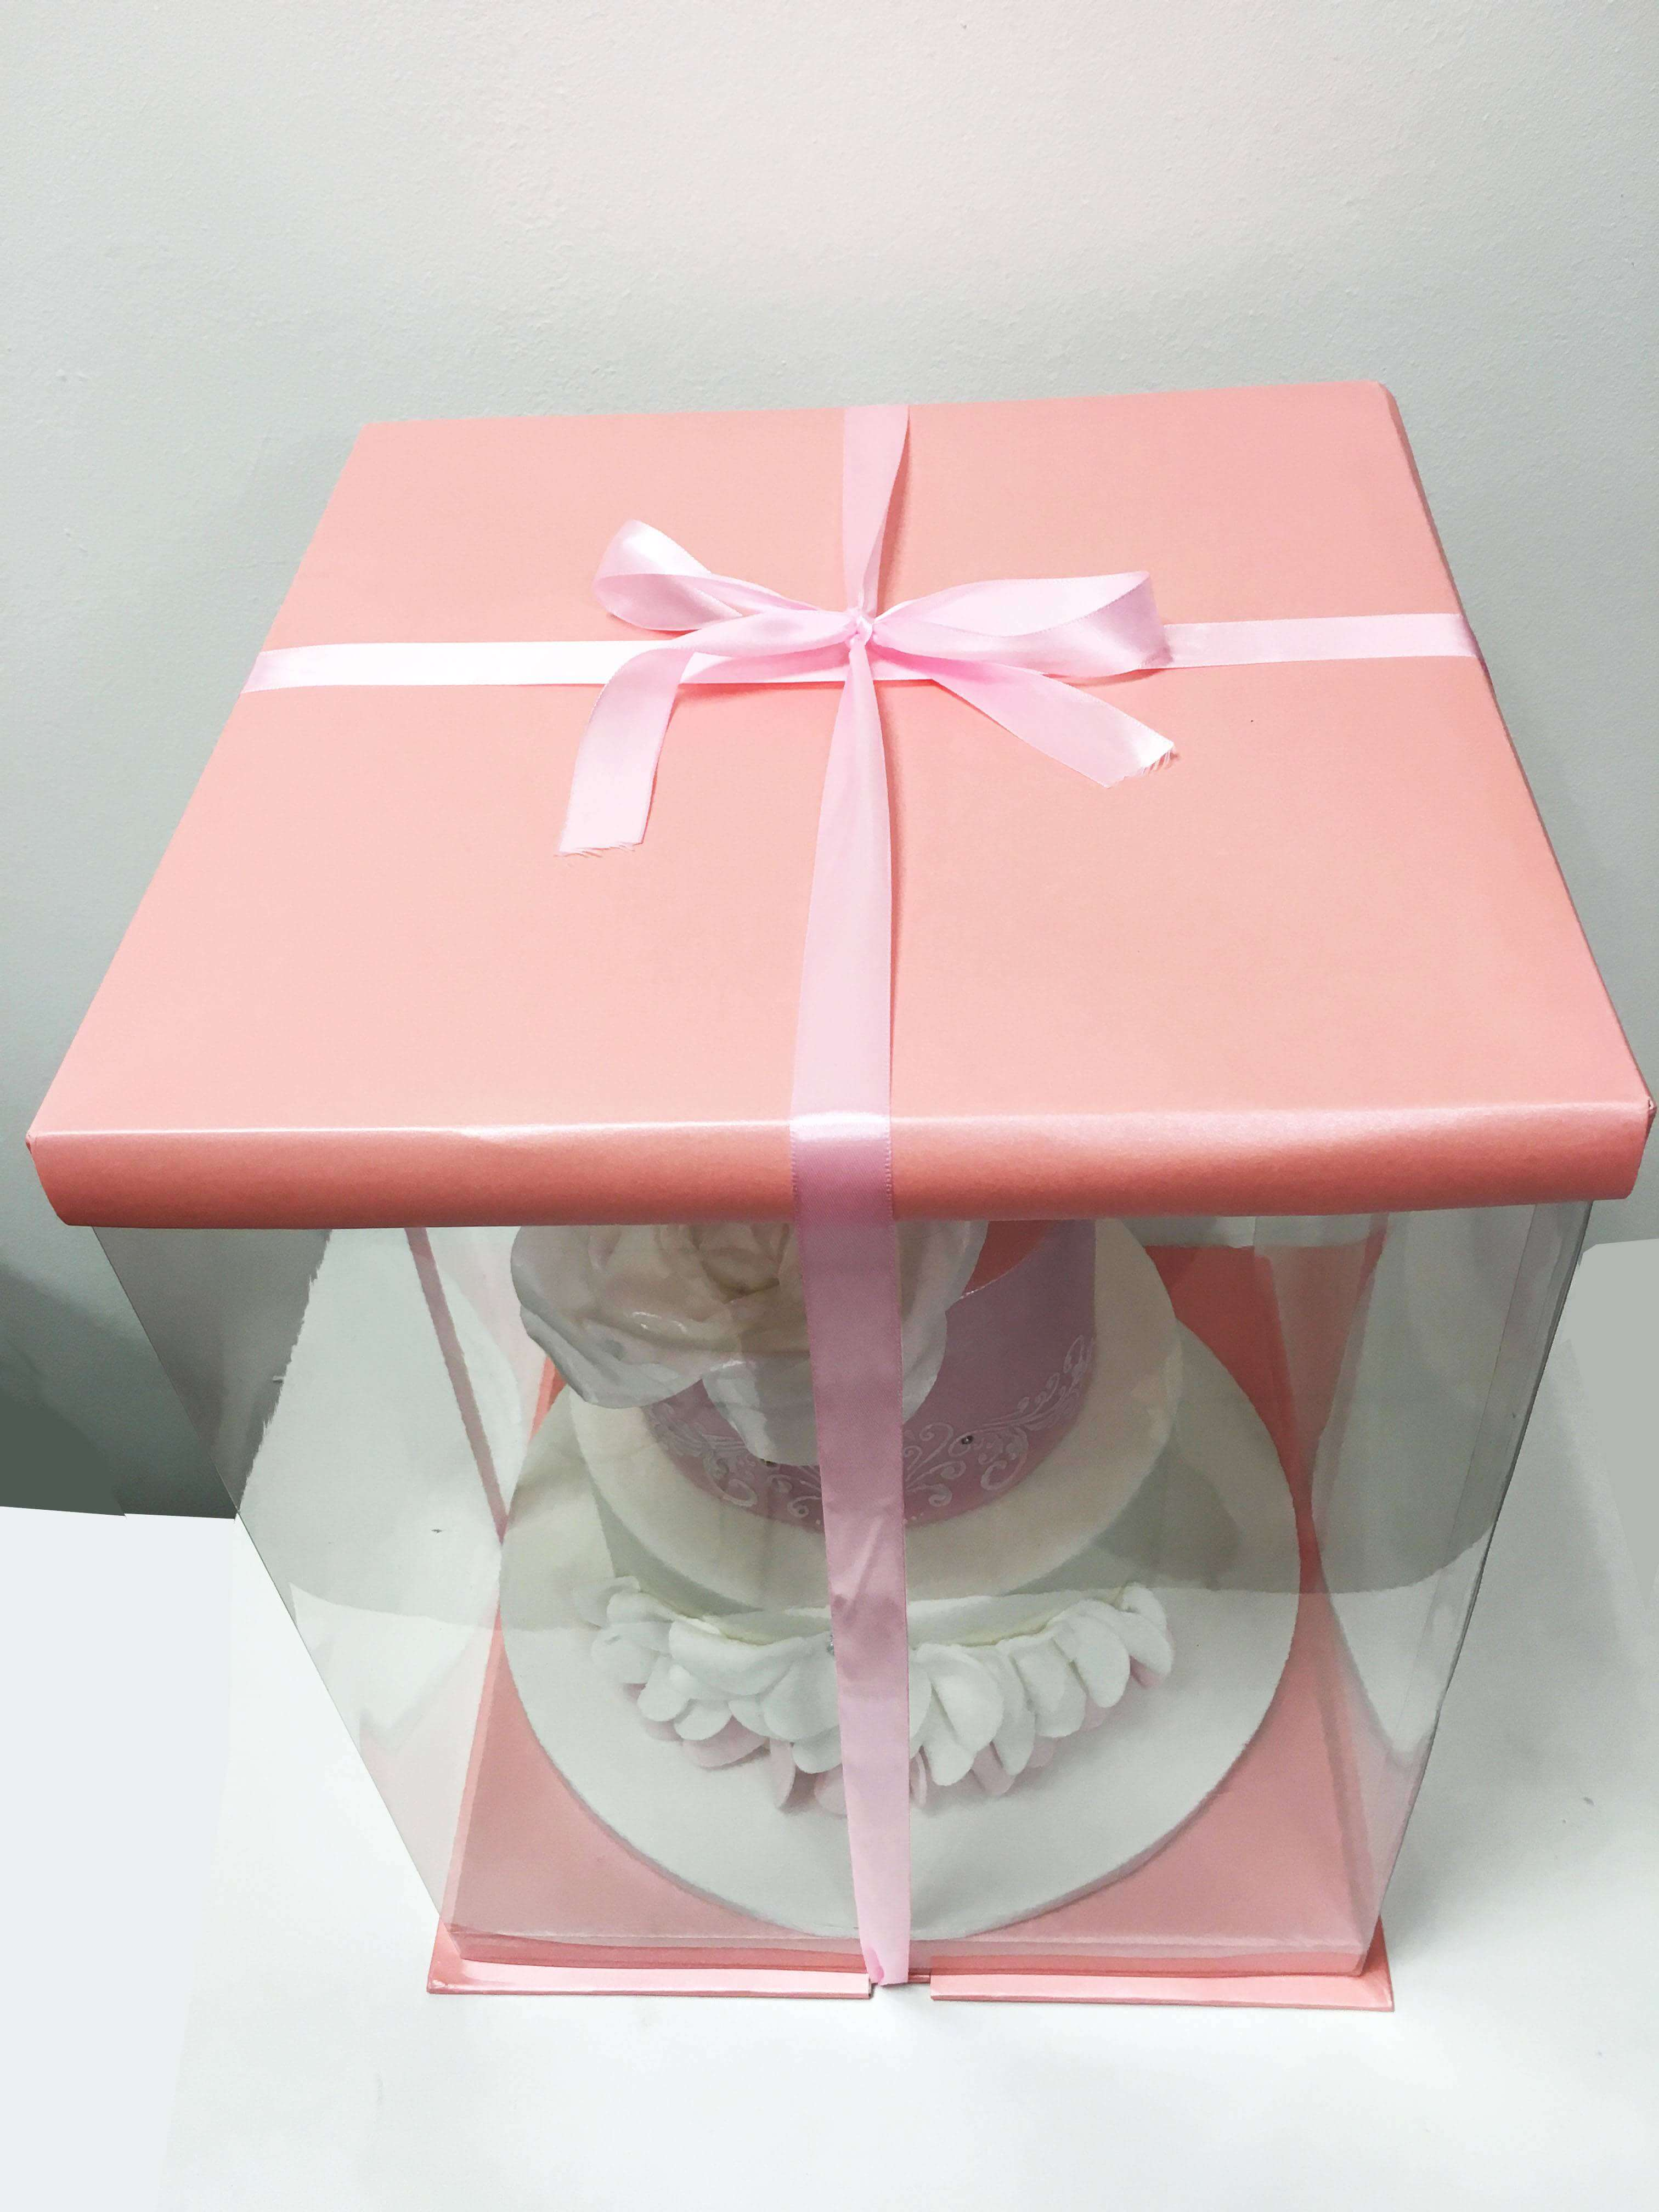 expo cake box pink cake box 30x30x40cm